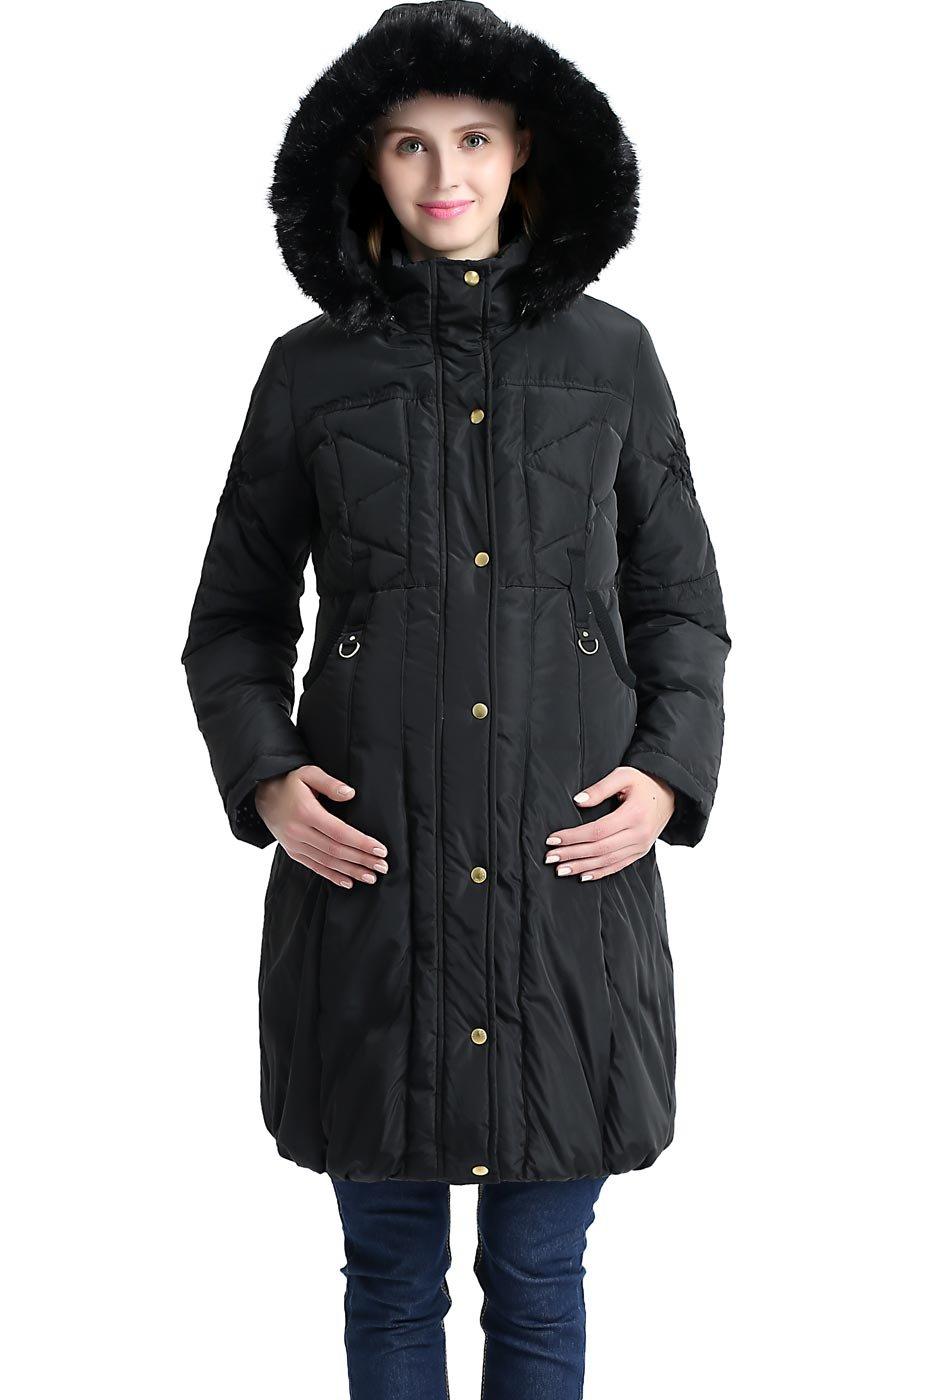 Momo Maternity Minnie Hooded Down Puffer Coat- Black L